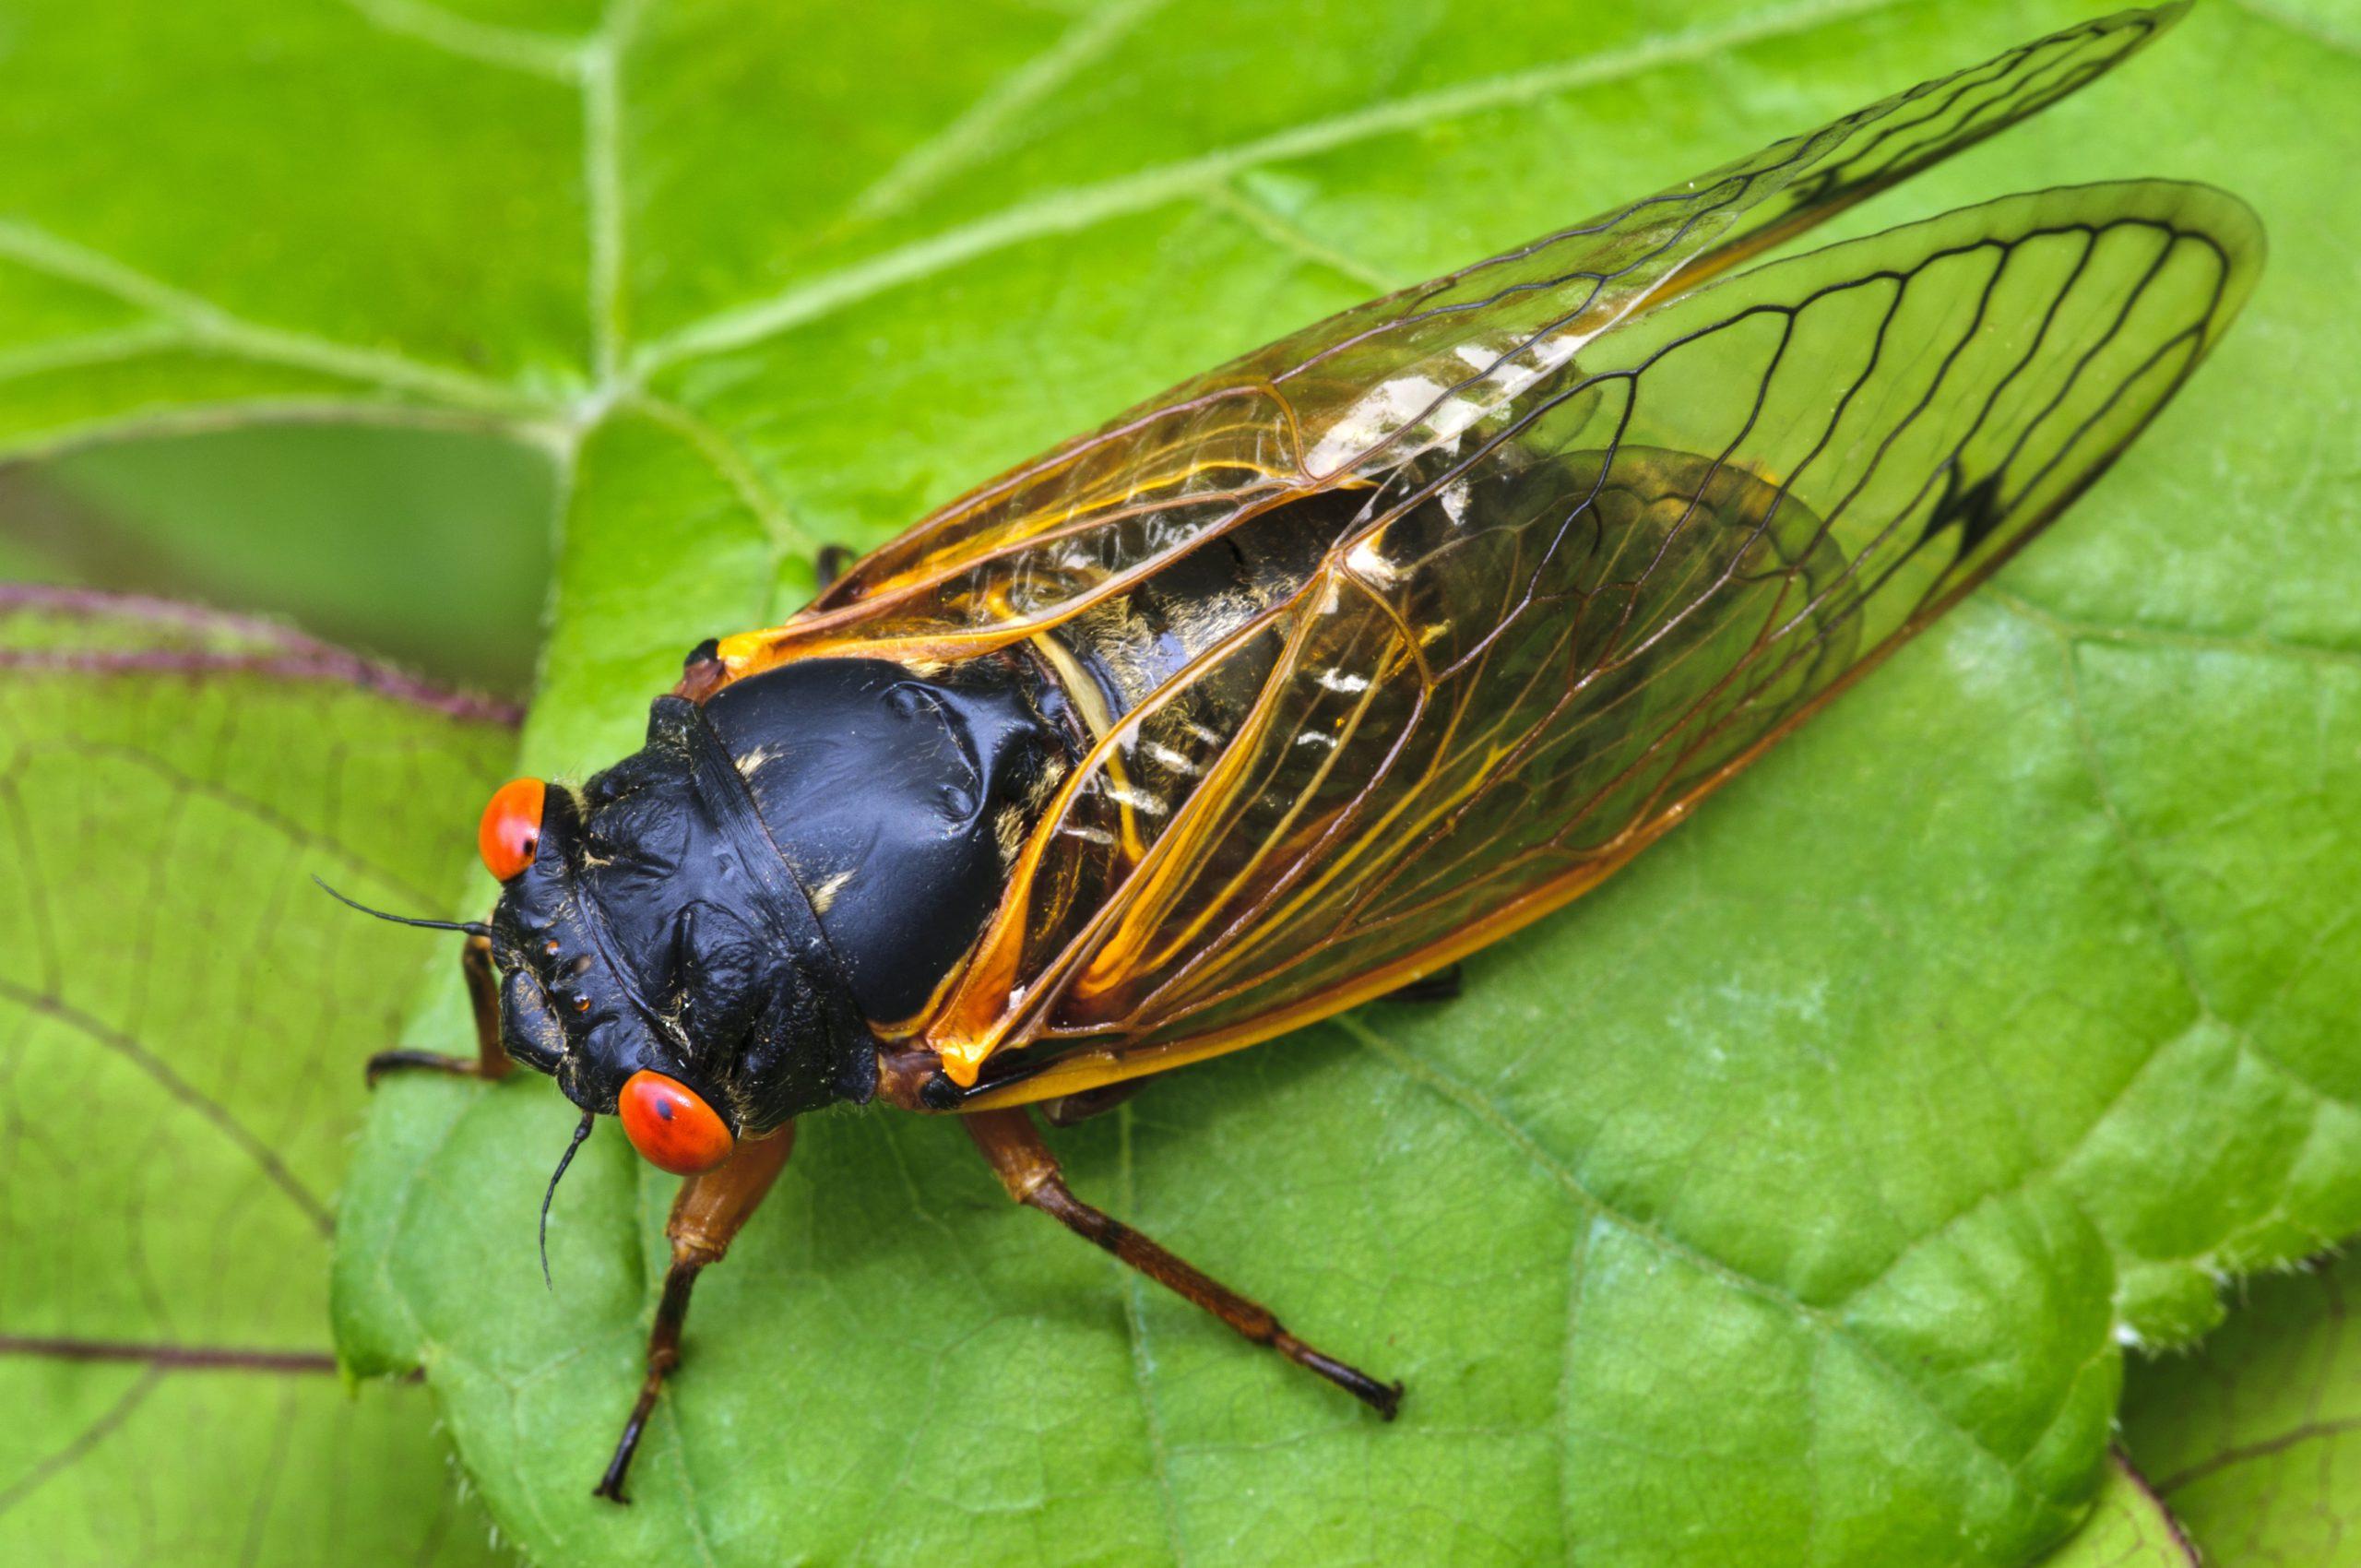 Cicada on a leaf outside.